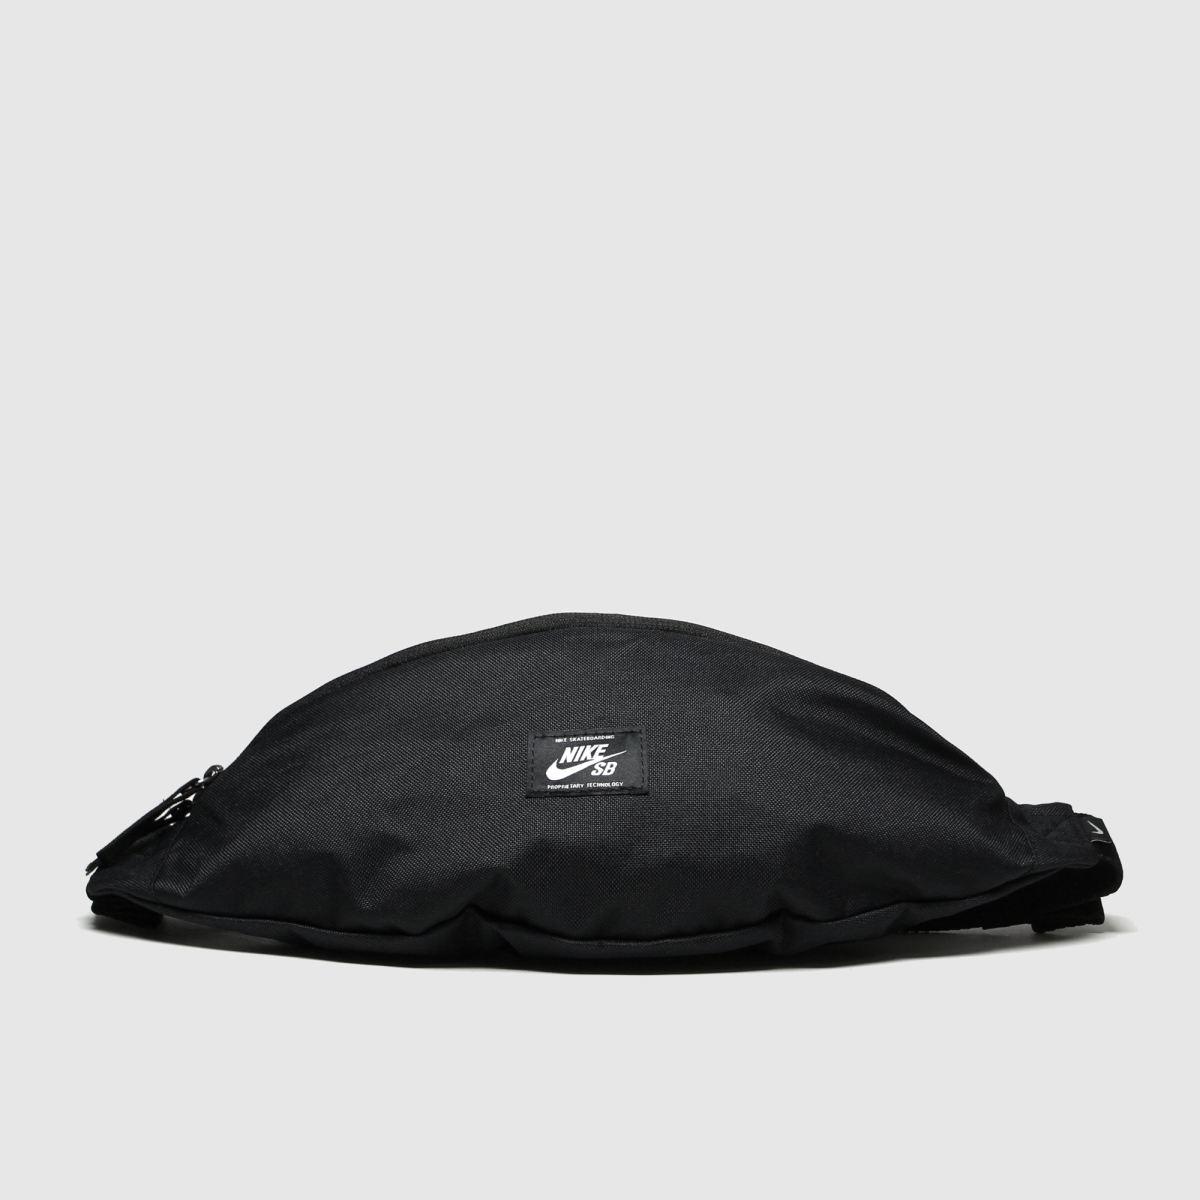 Nike SB Accessories Nike SB Black & White Heritage Hip Pack